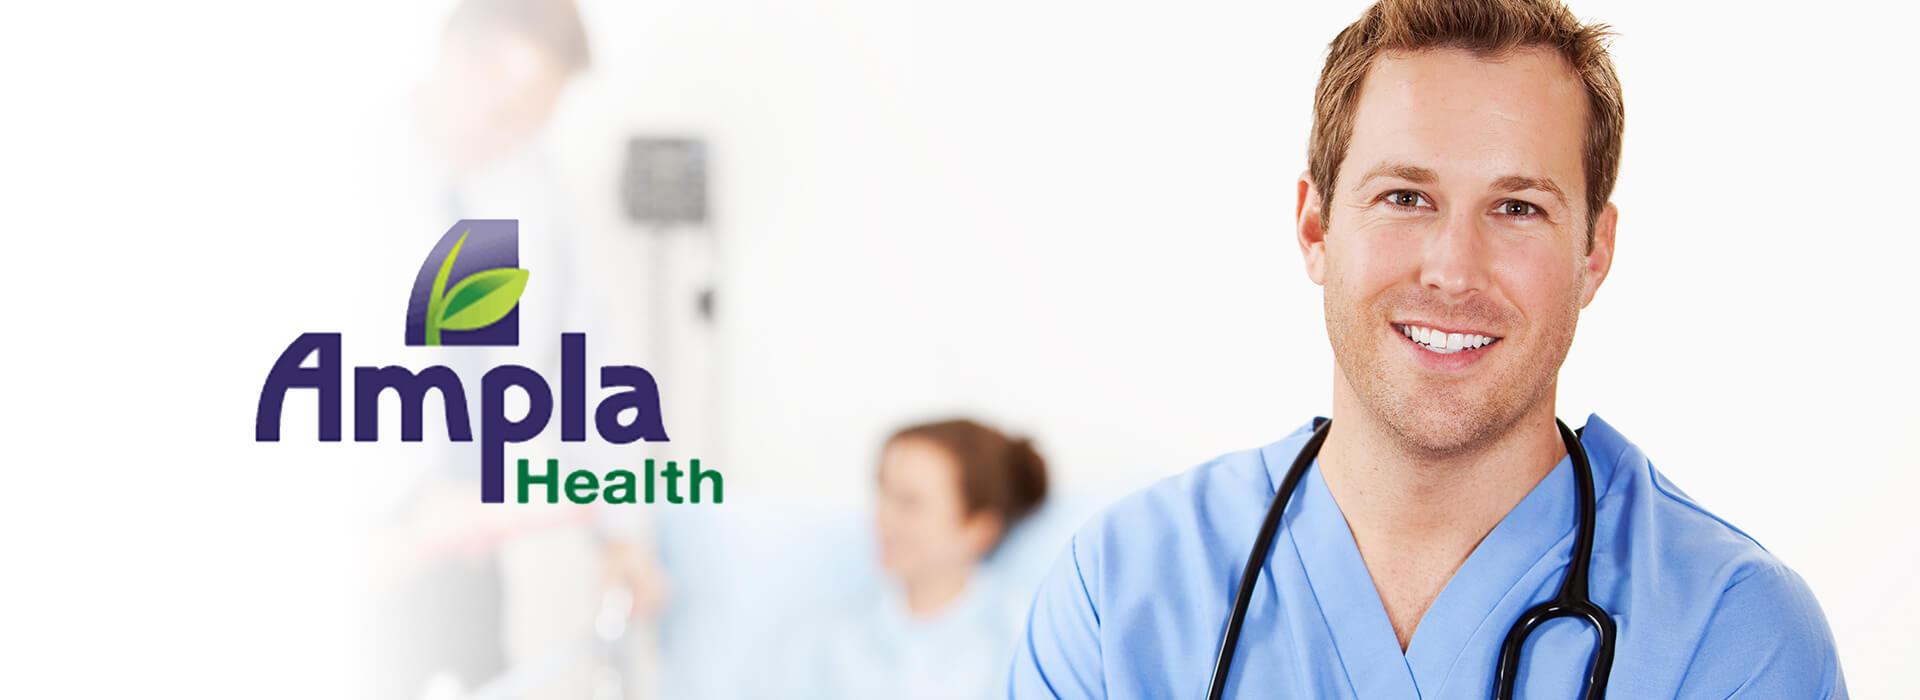 Ampla Health | Medical, Dental, Behavioral Health, & Specialty Services